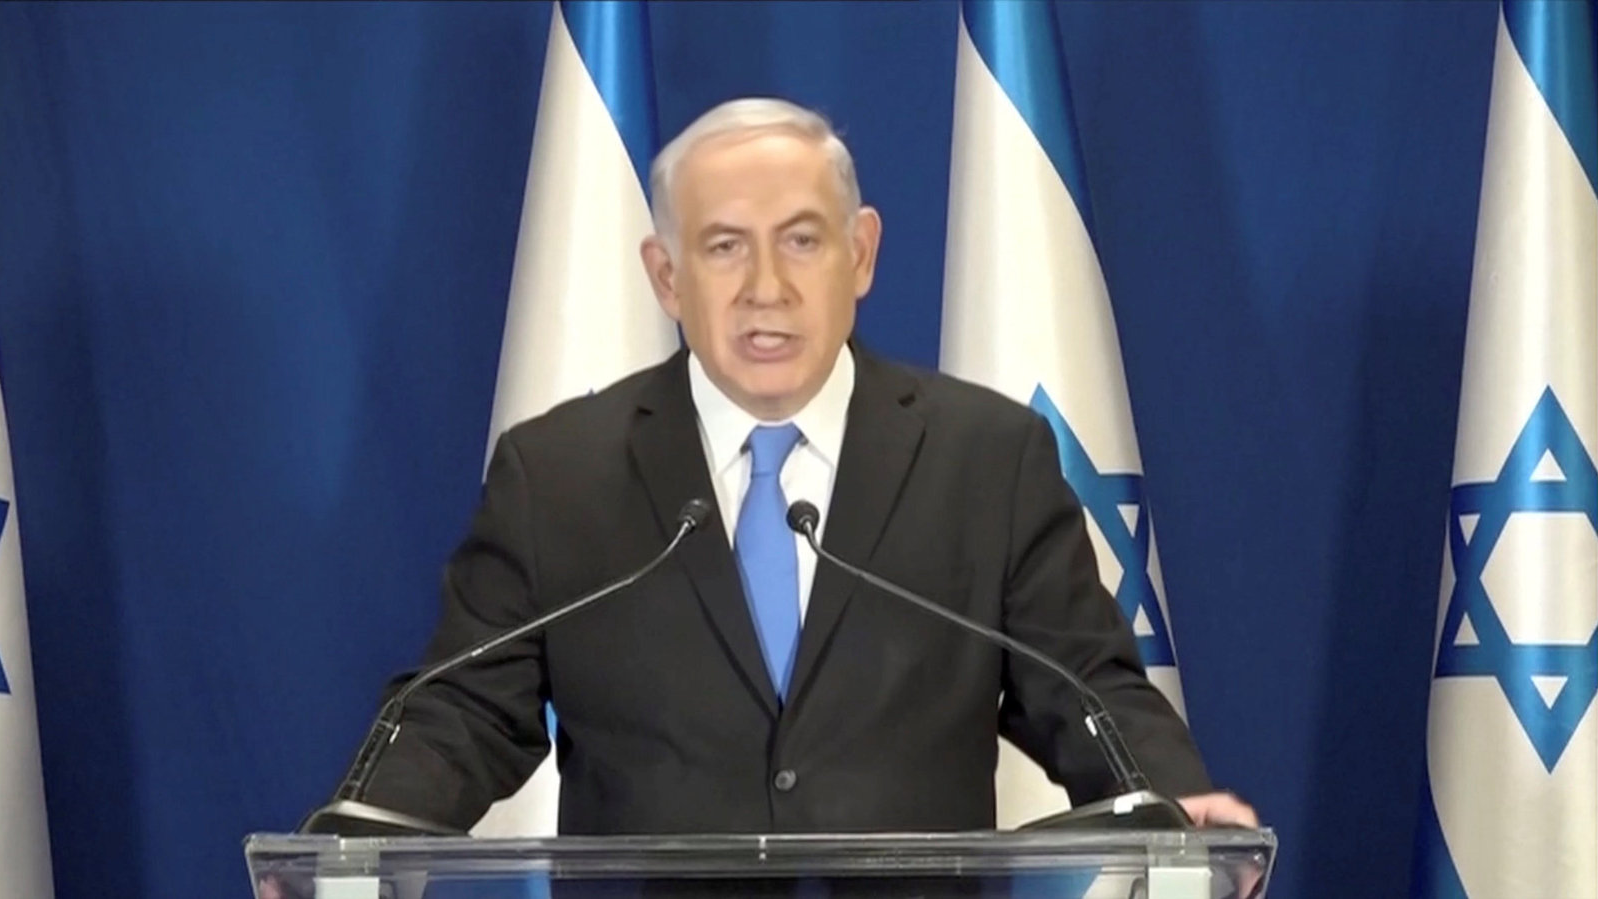 Israeli Prime Minister Benjamin Netanyahu delivers a statement in Jerusalem, in this picture grab taken Feb. 13, 2018.